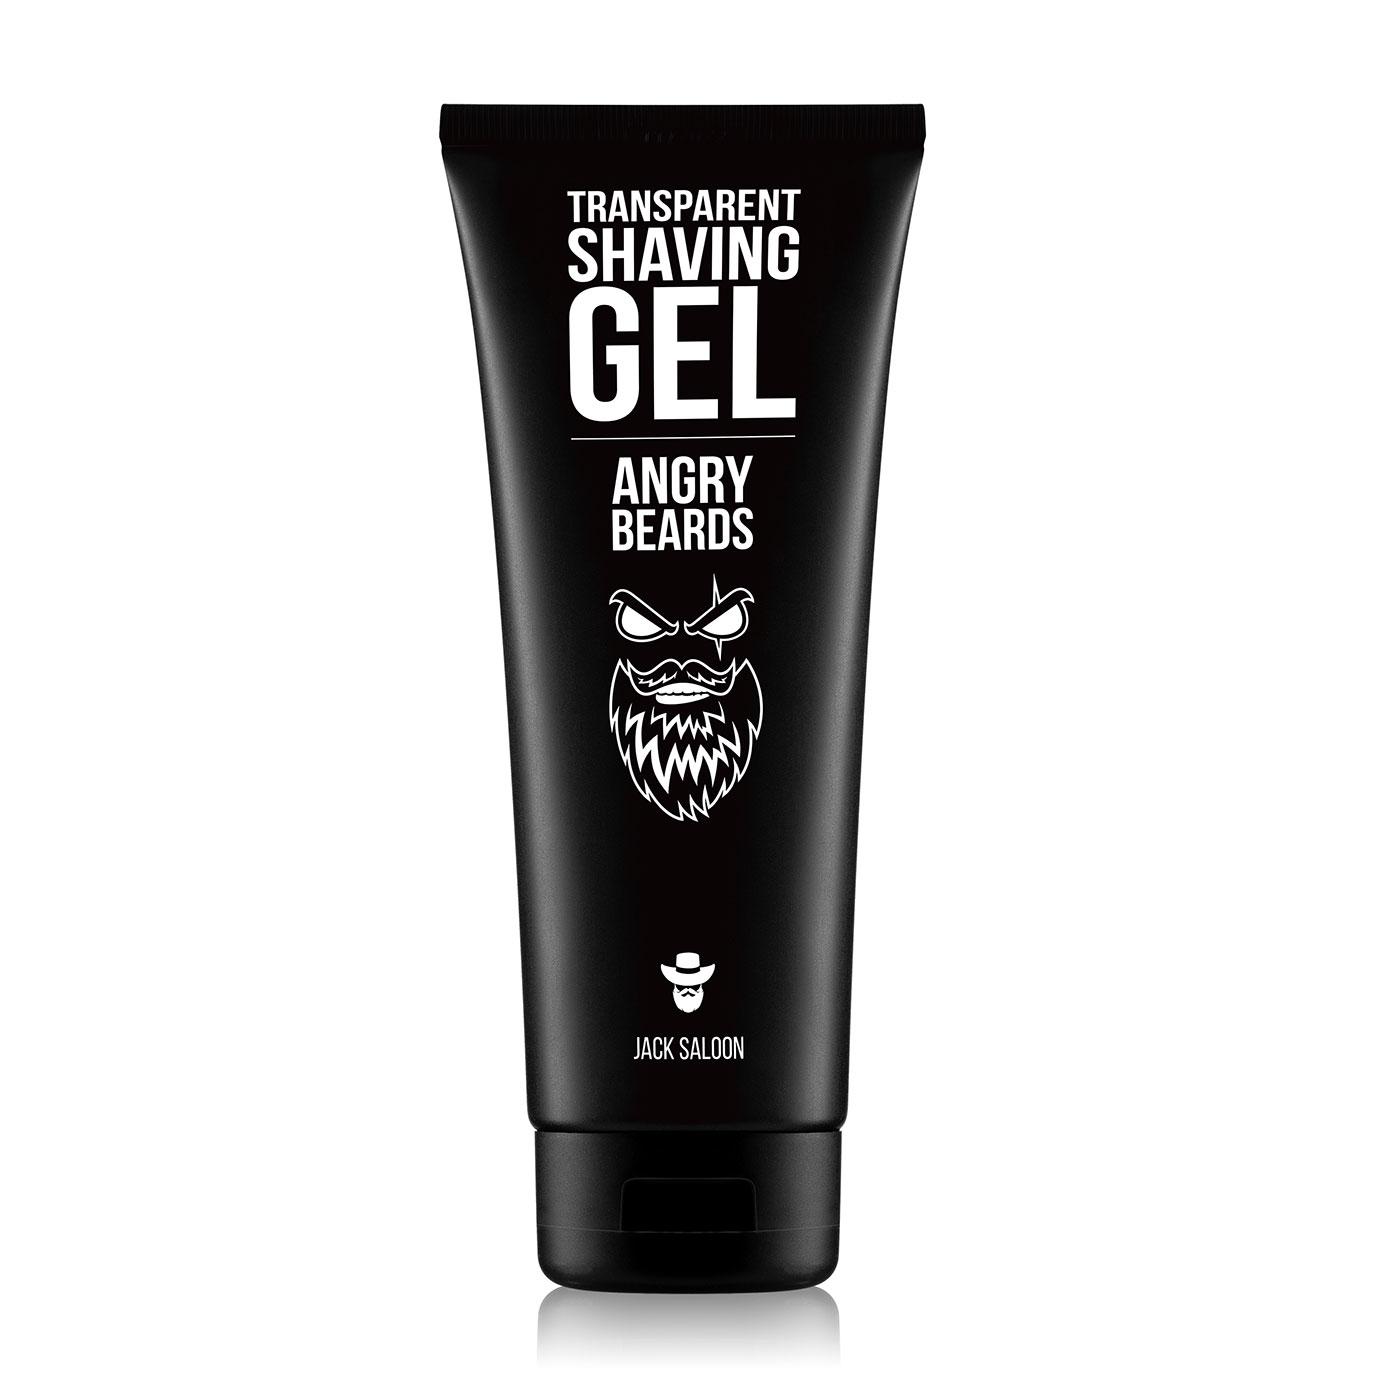 angry-beards-transparent-shaving-gel-p1-1400px